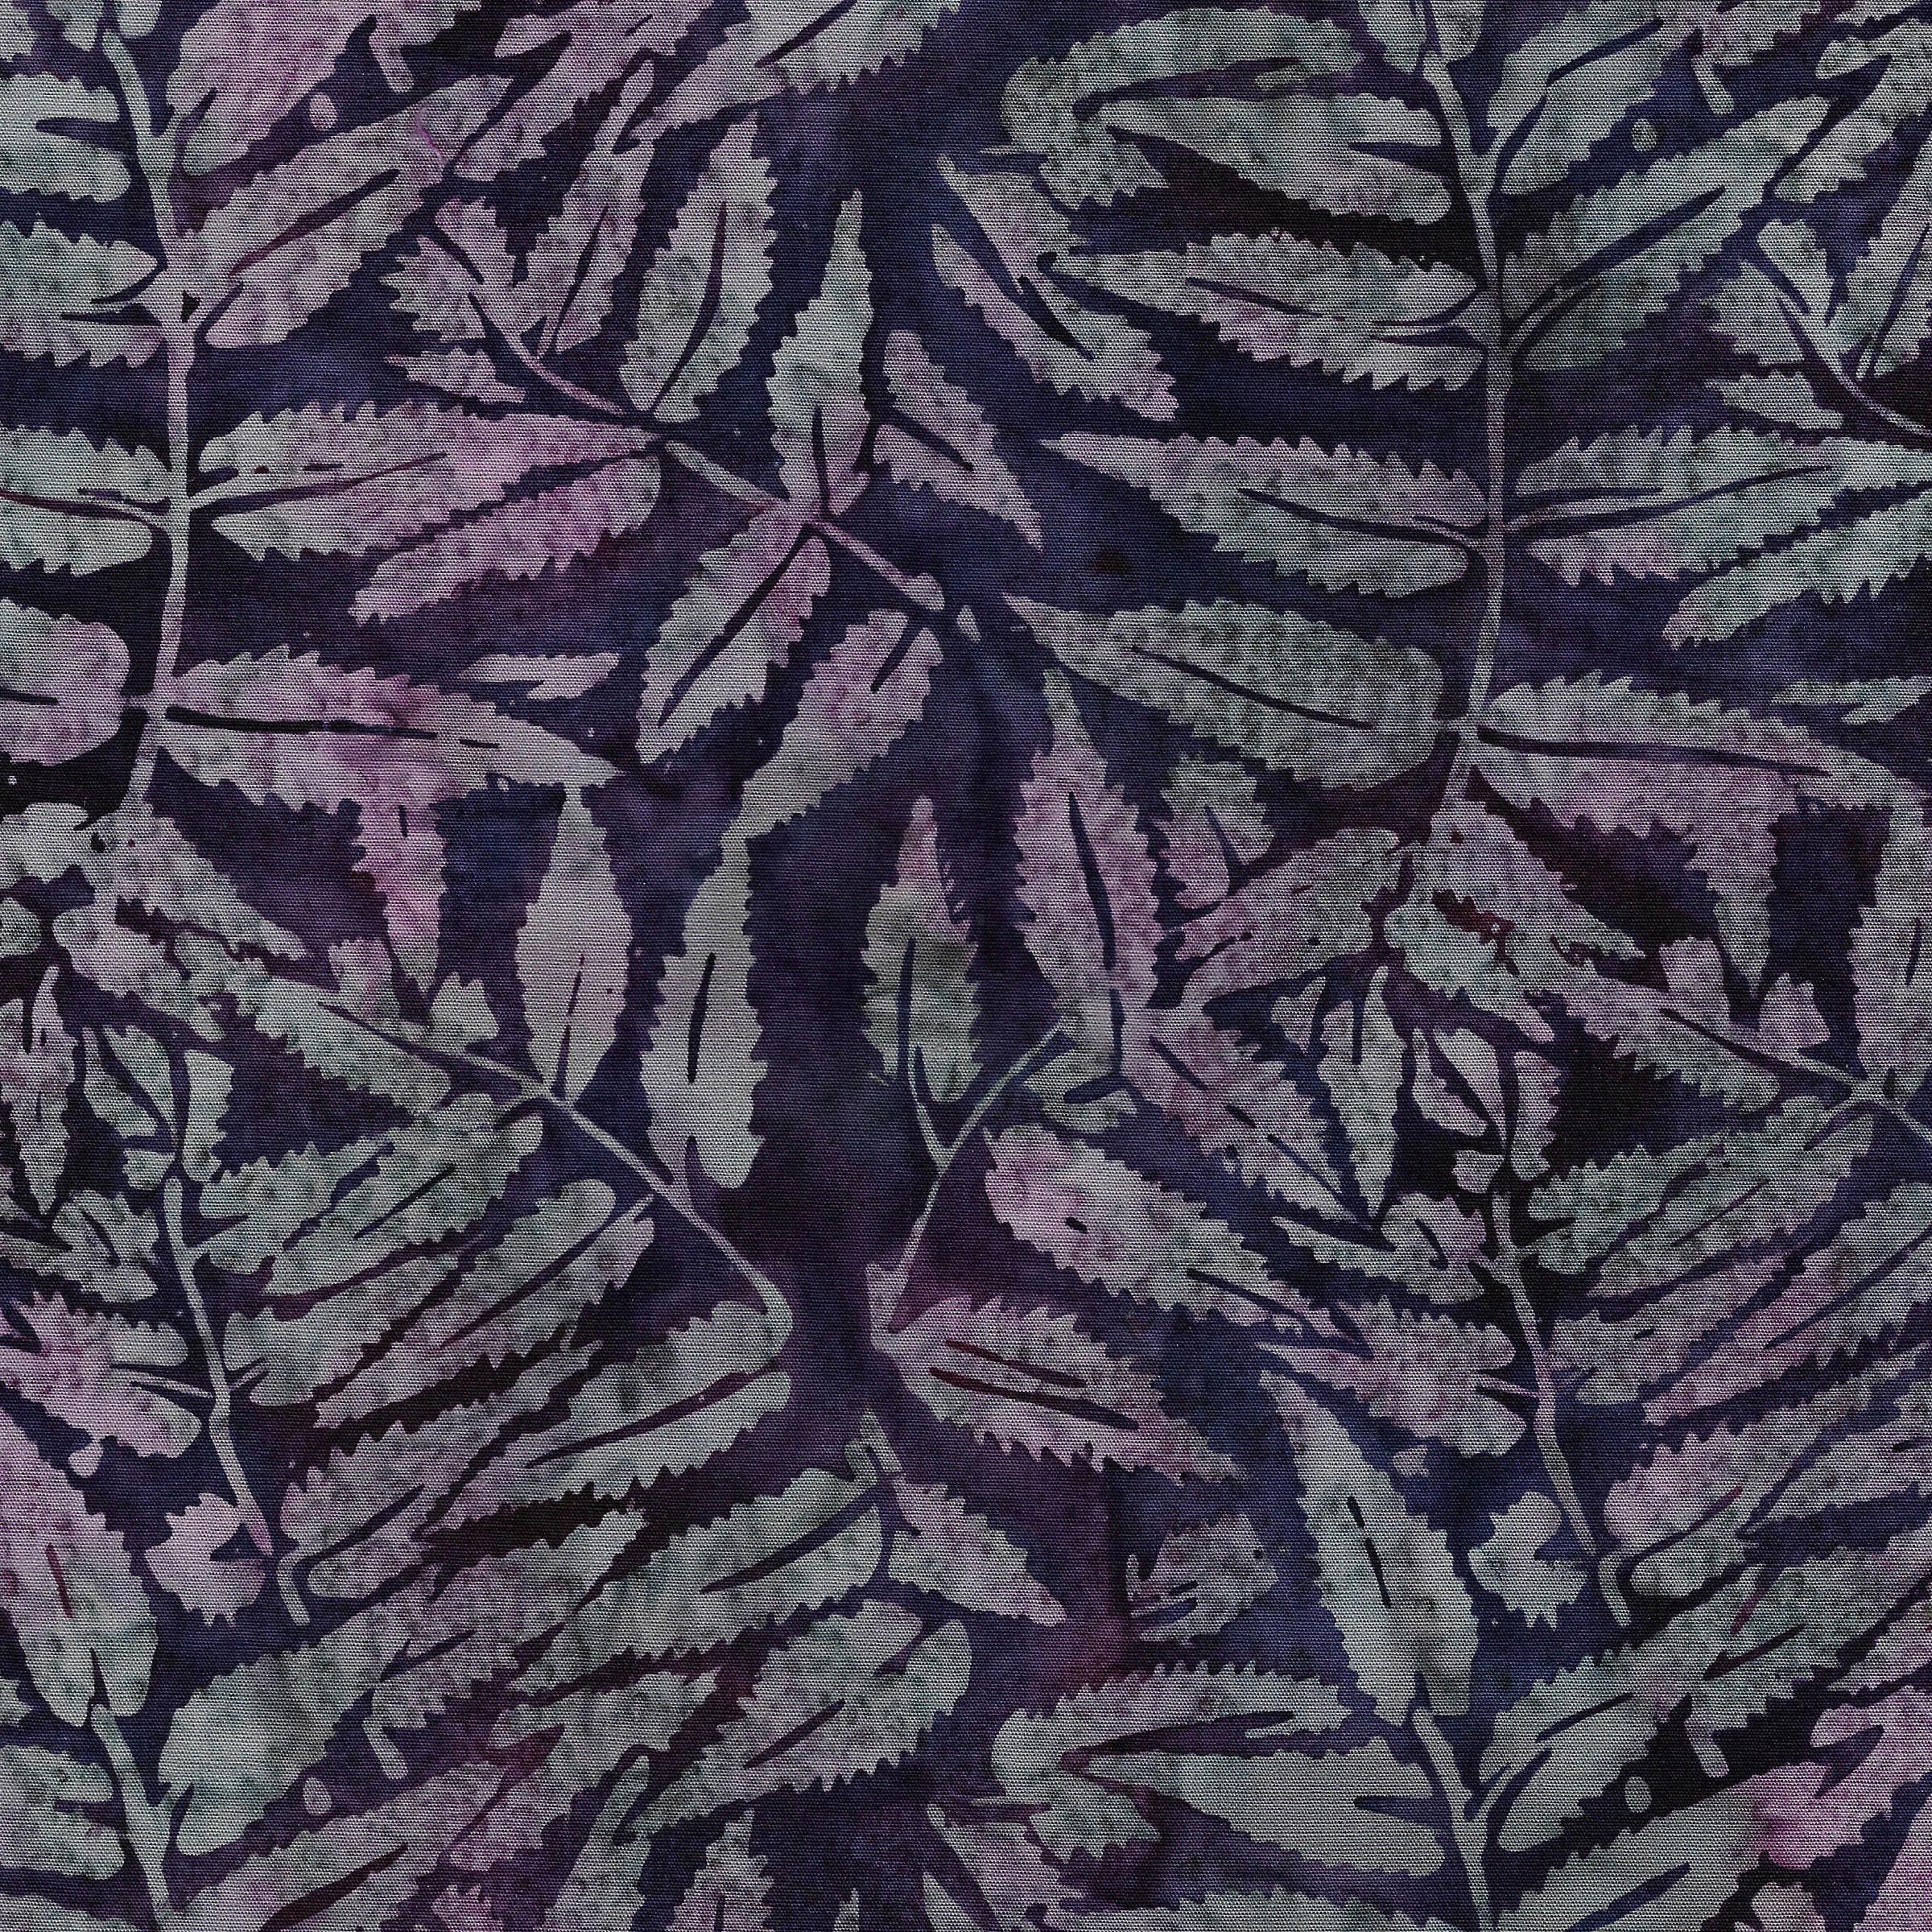 111930495 / Fern Leaves -Eggplant